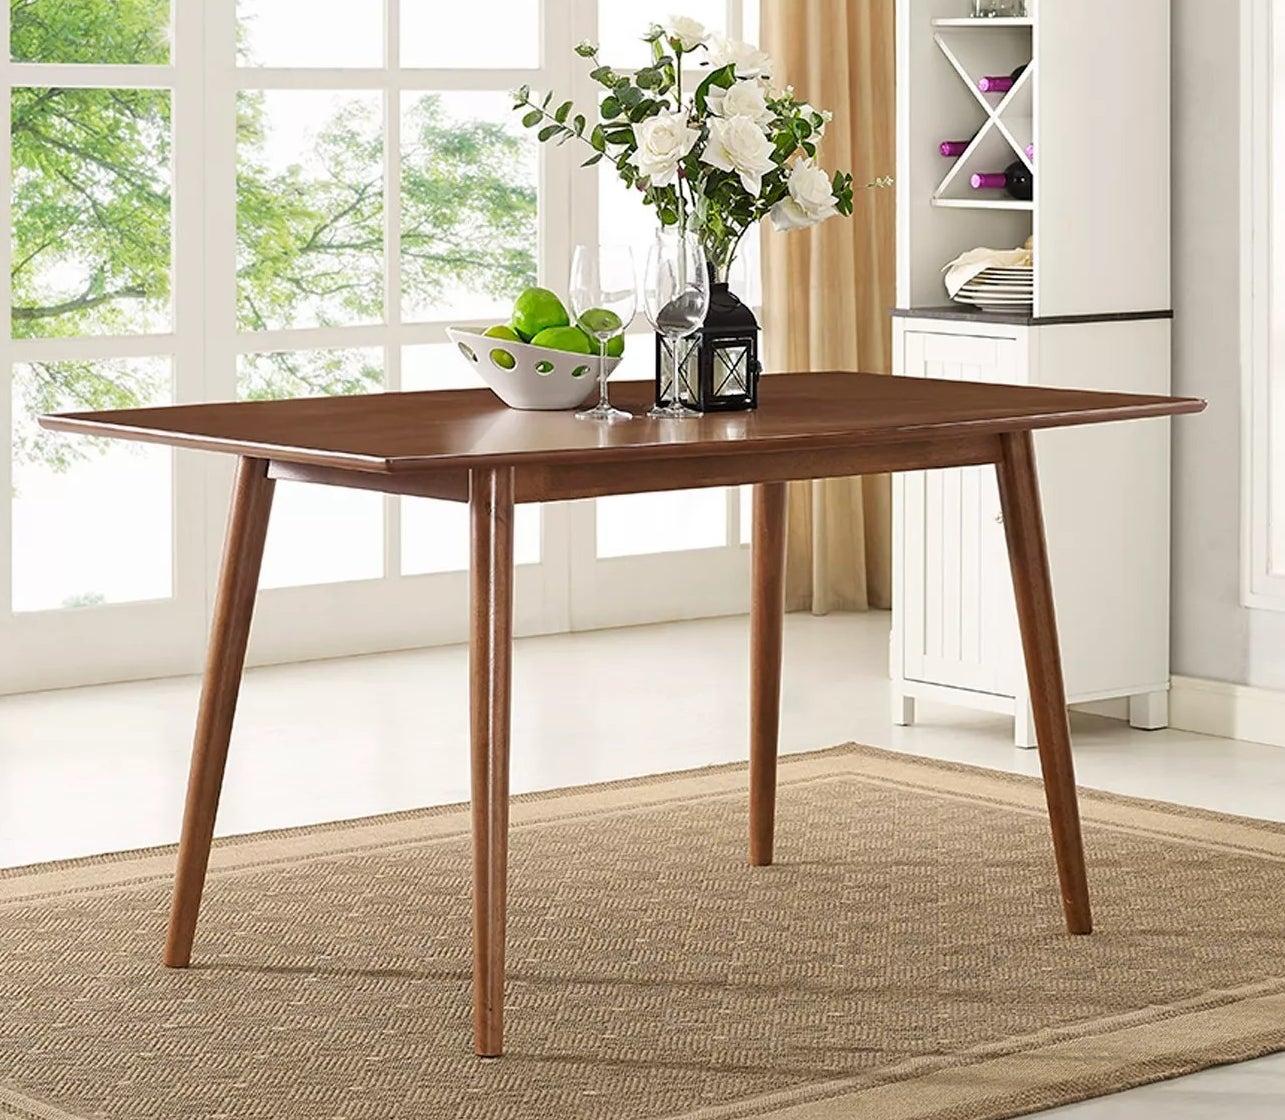 The dark wood table